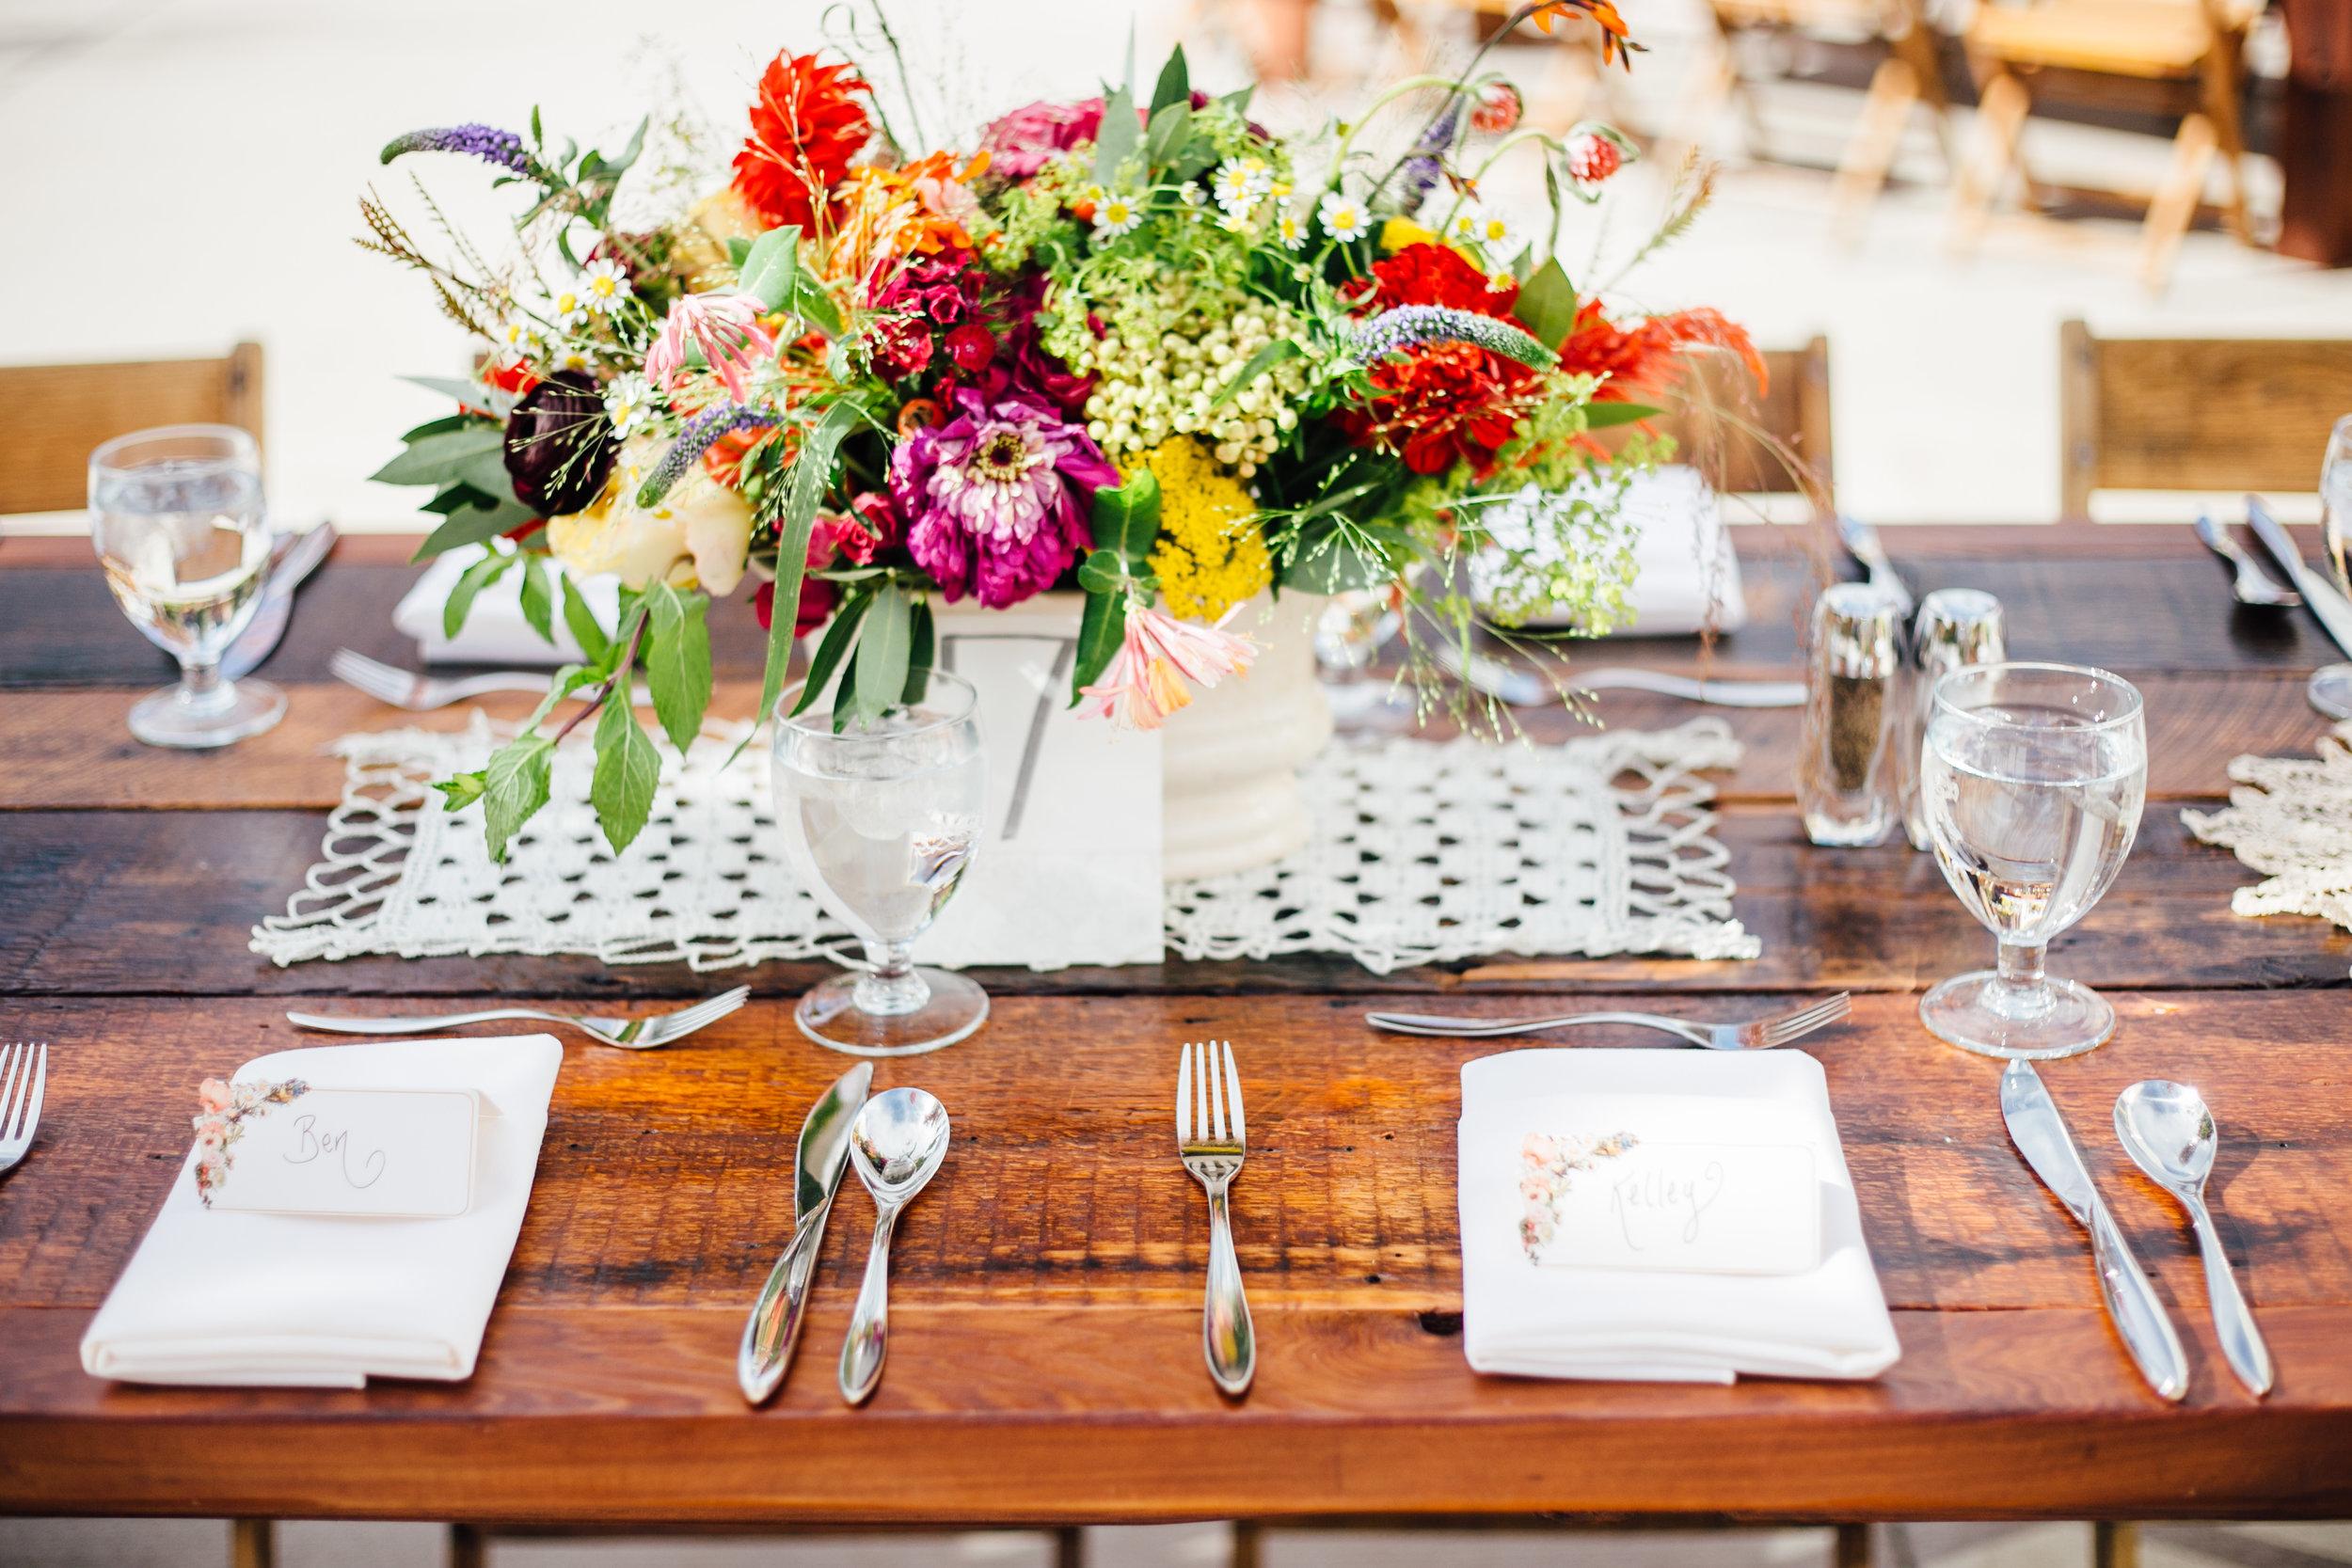 Bright Flowers and Square Doily Centerpiece Reception Brookside Gardens Berthoud Colorado Wedding